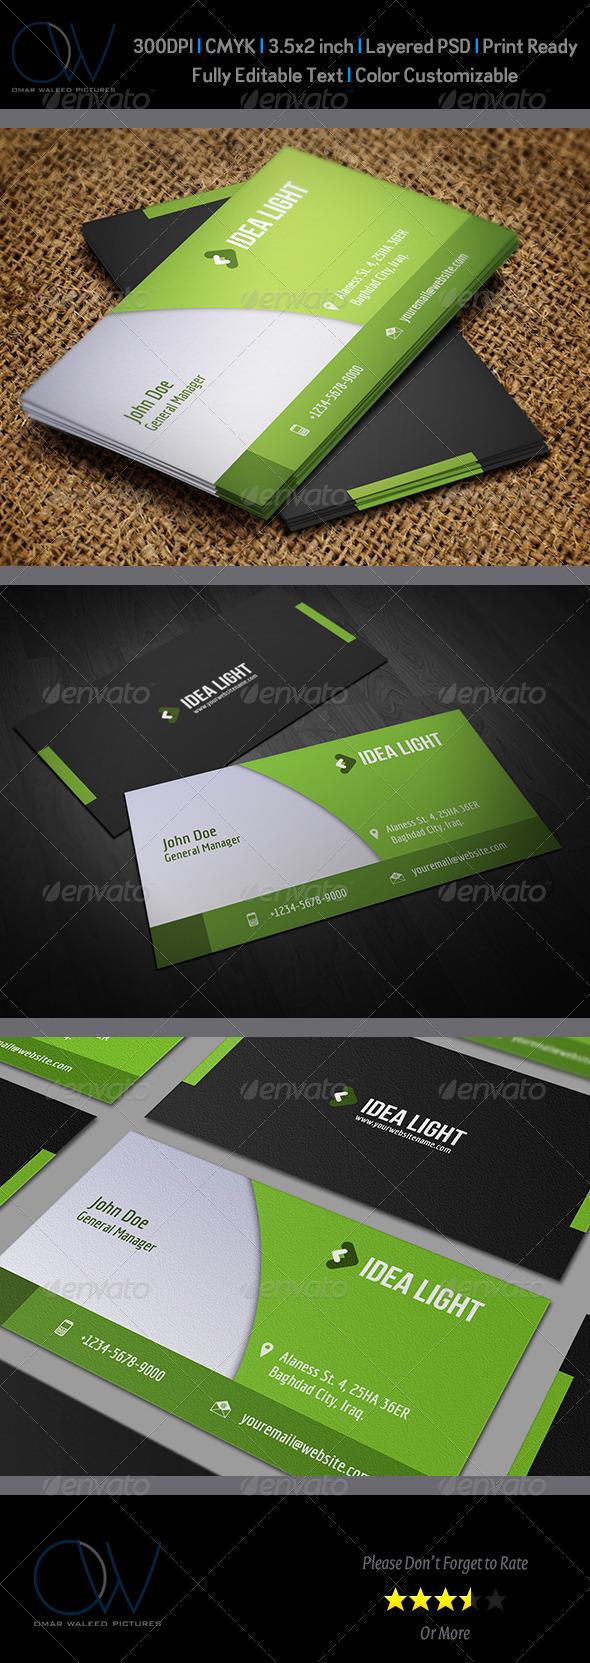 Corporate Business Card Vol.18 - Corporate Business Cards